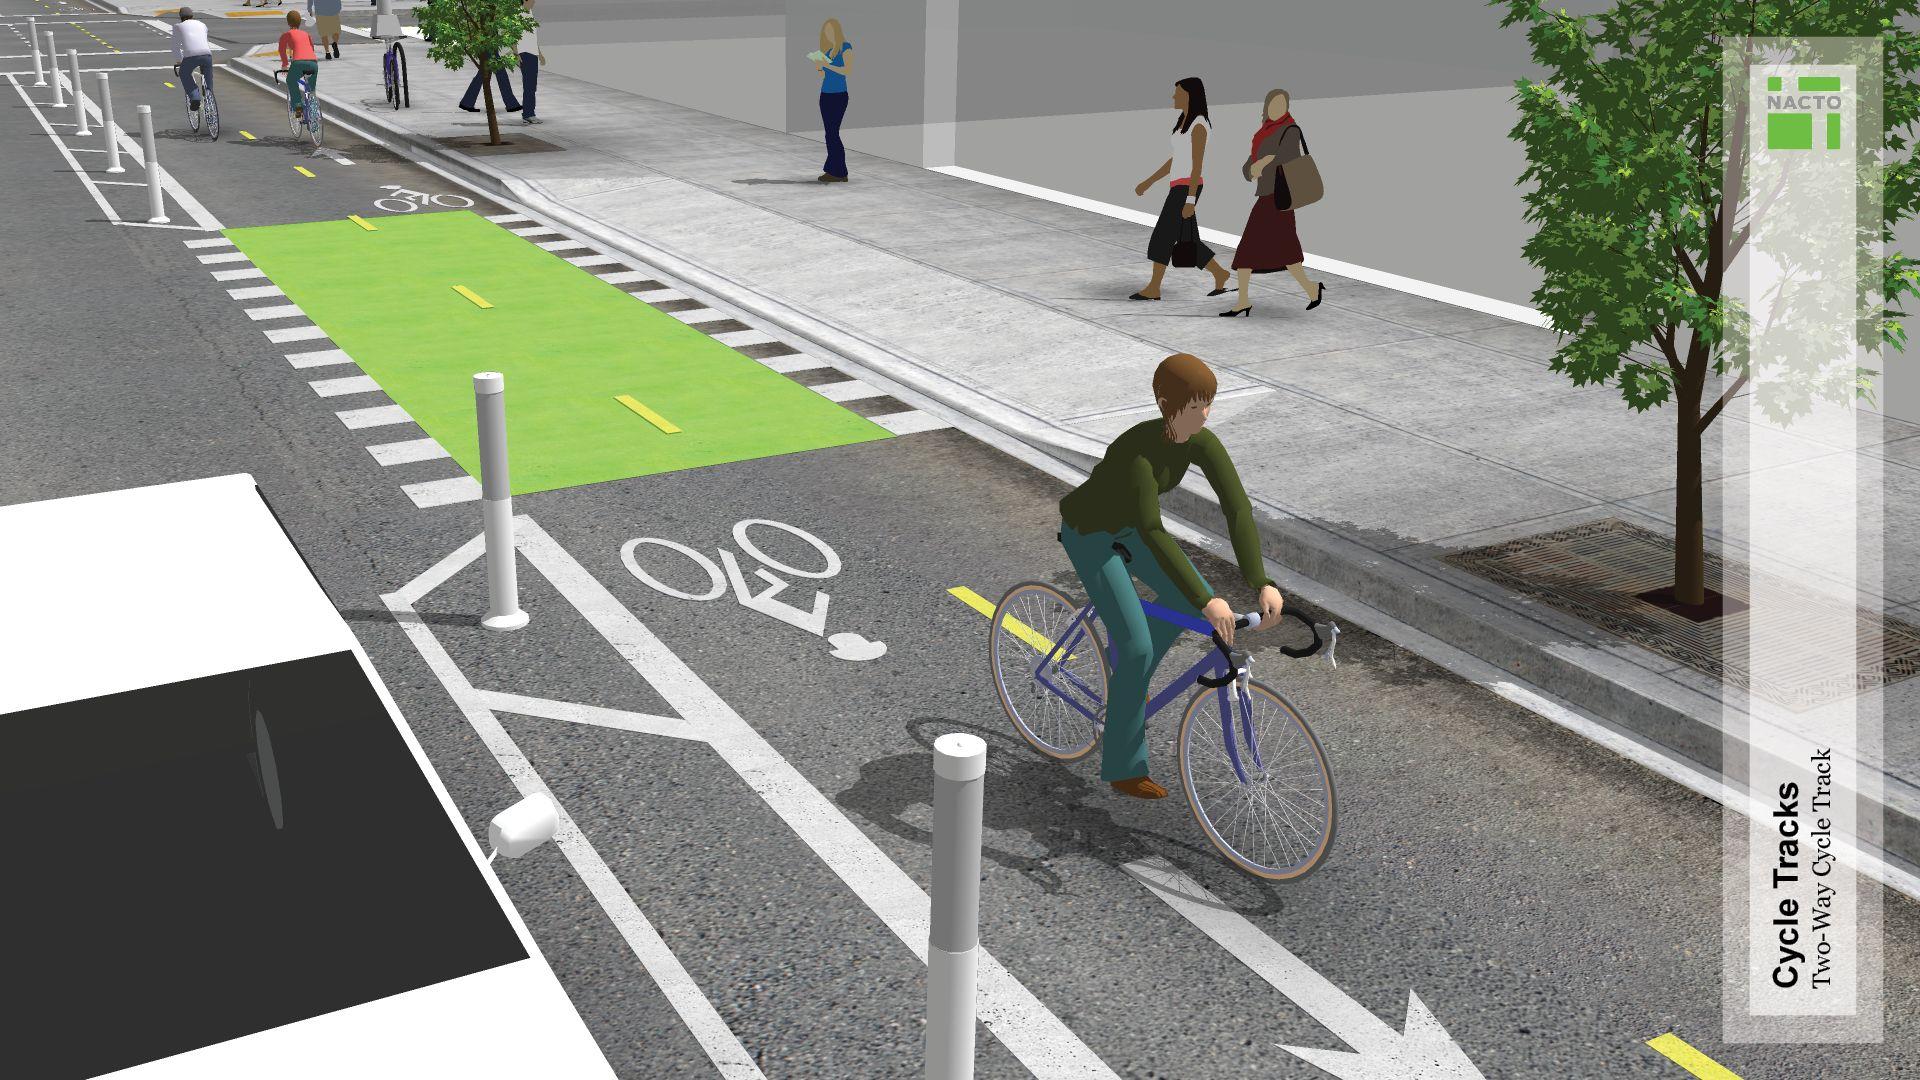 Two Way Cycle Tracks National Association Of City Transportation Officials Bike Lane Urban Landscape Design Track